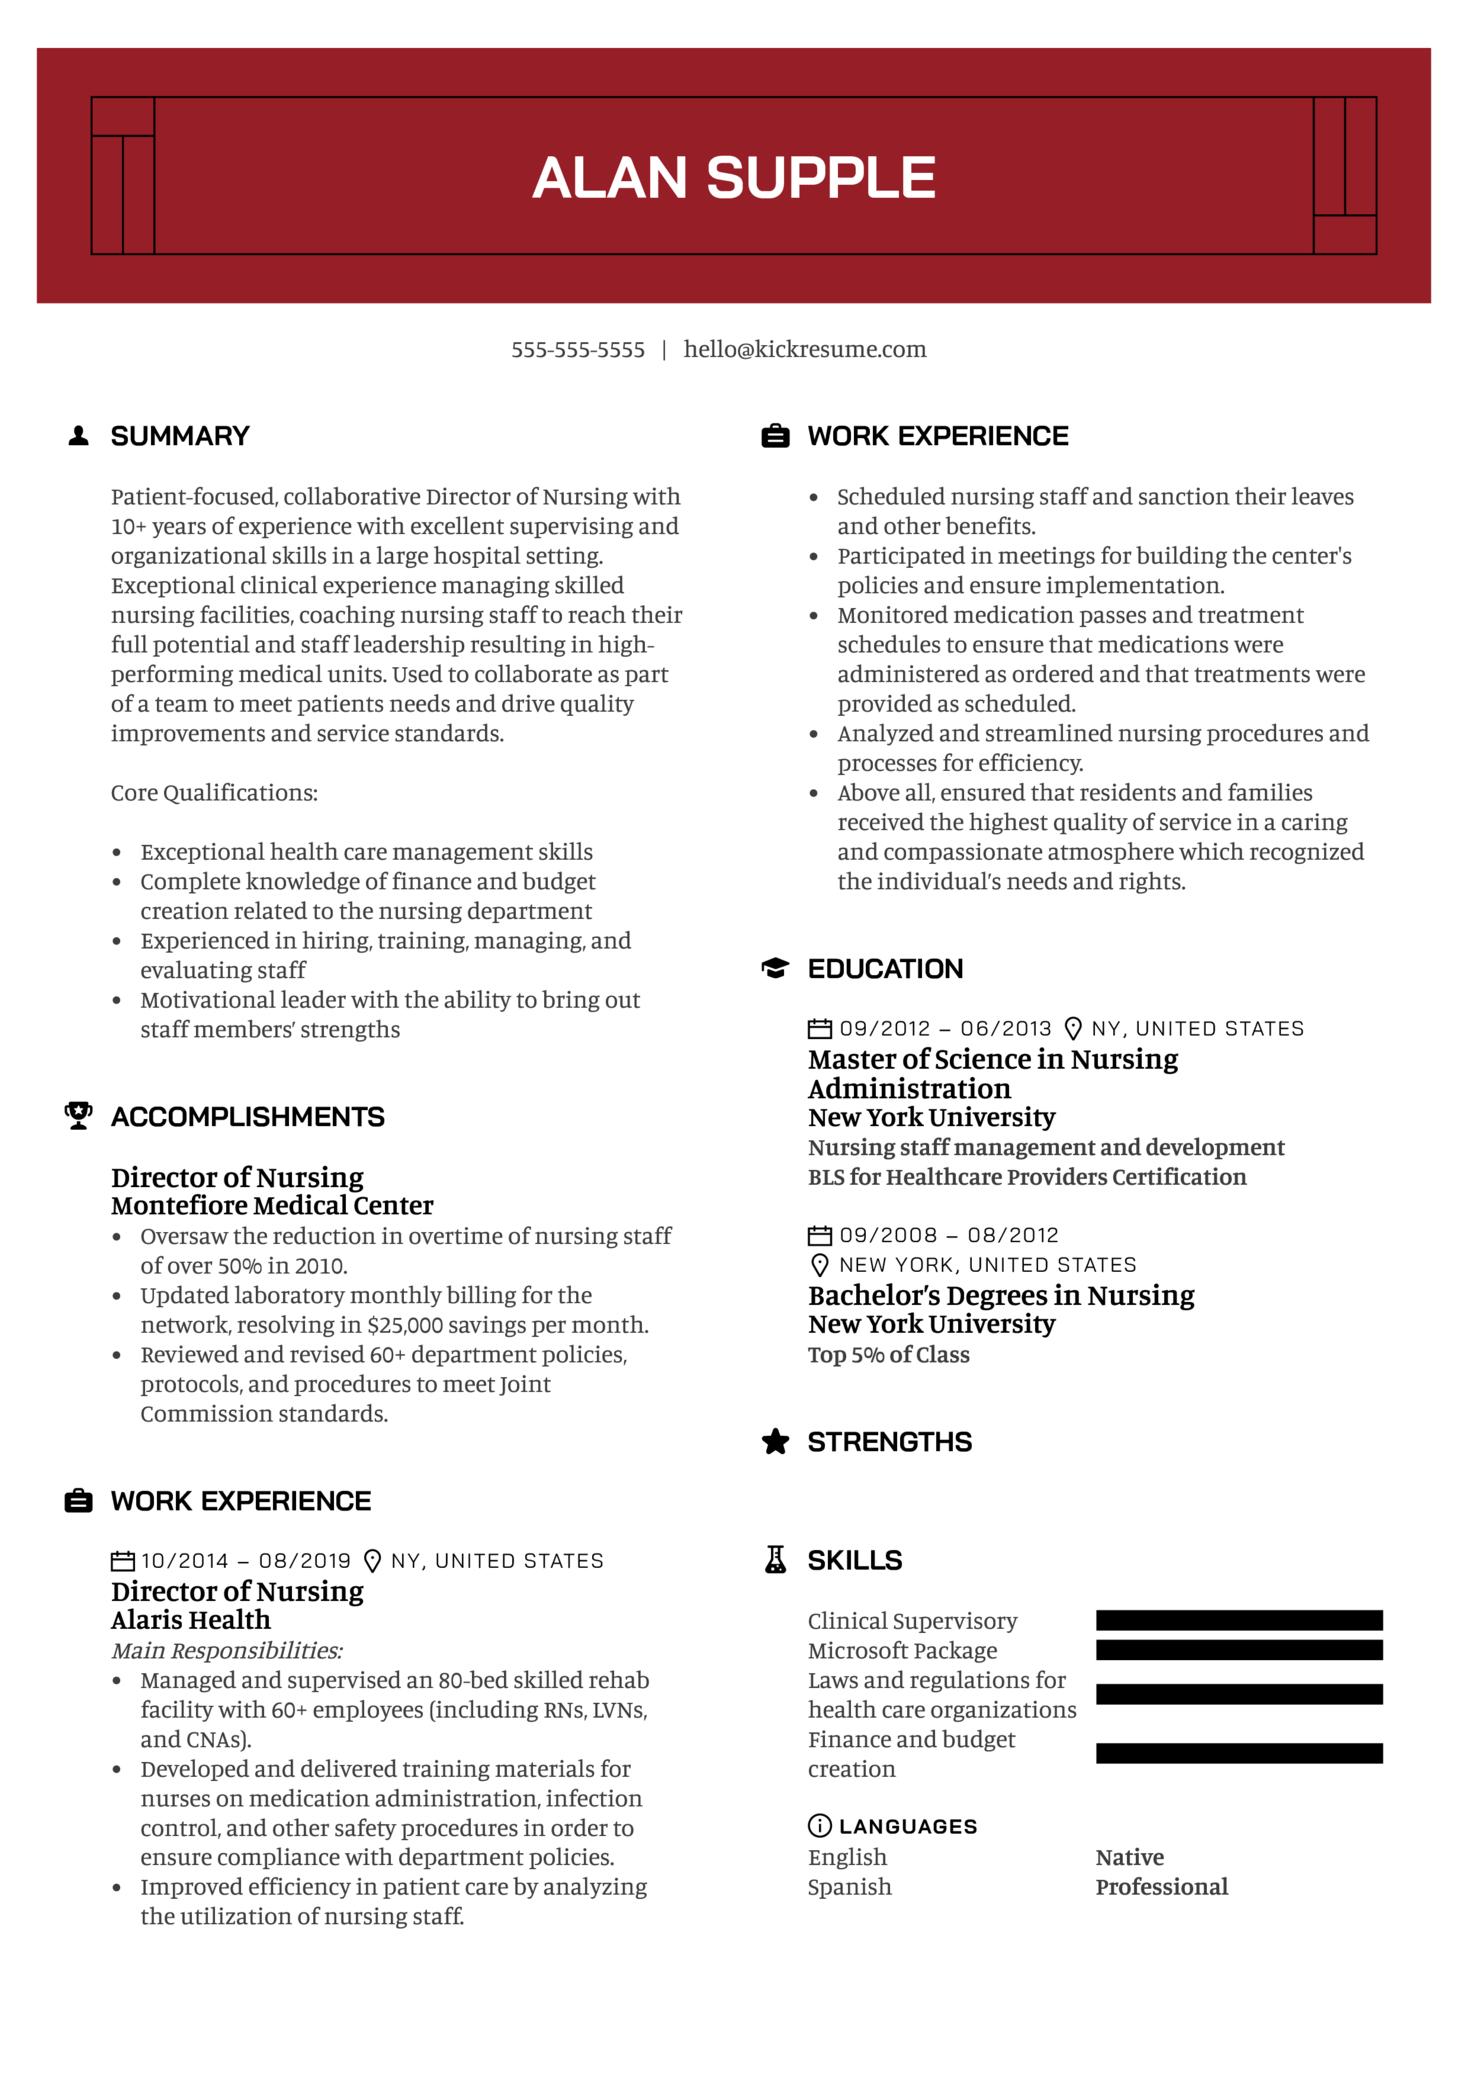 Director of Nursing Resume Example (parte 1)